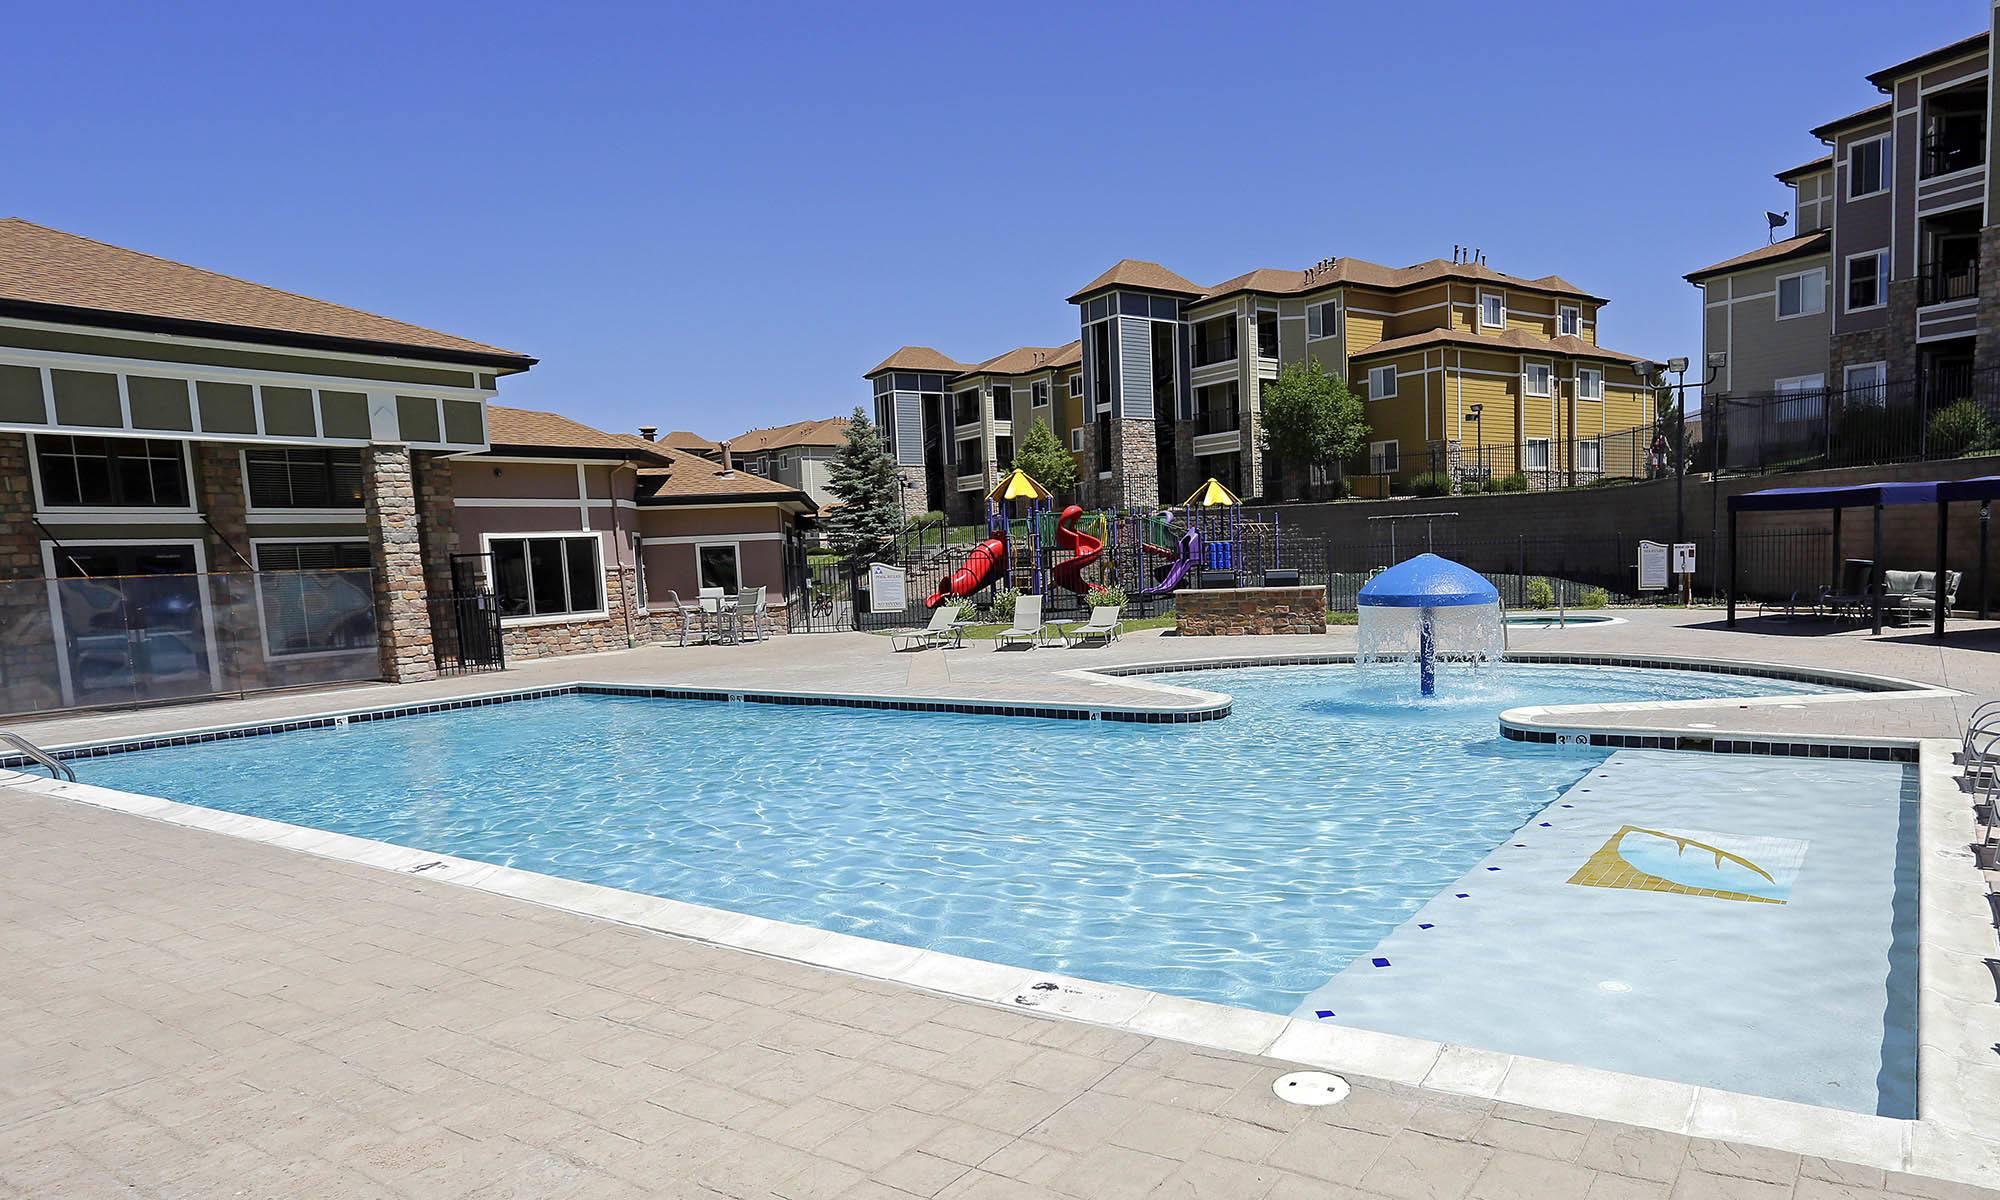 Apartments in Aurora, CO